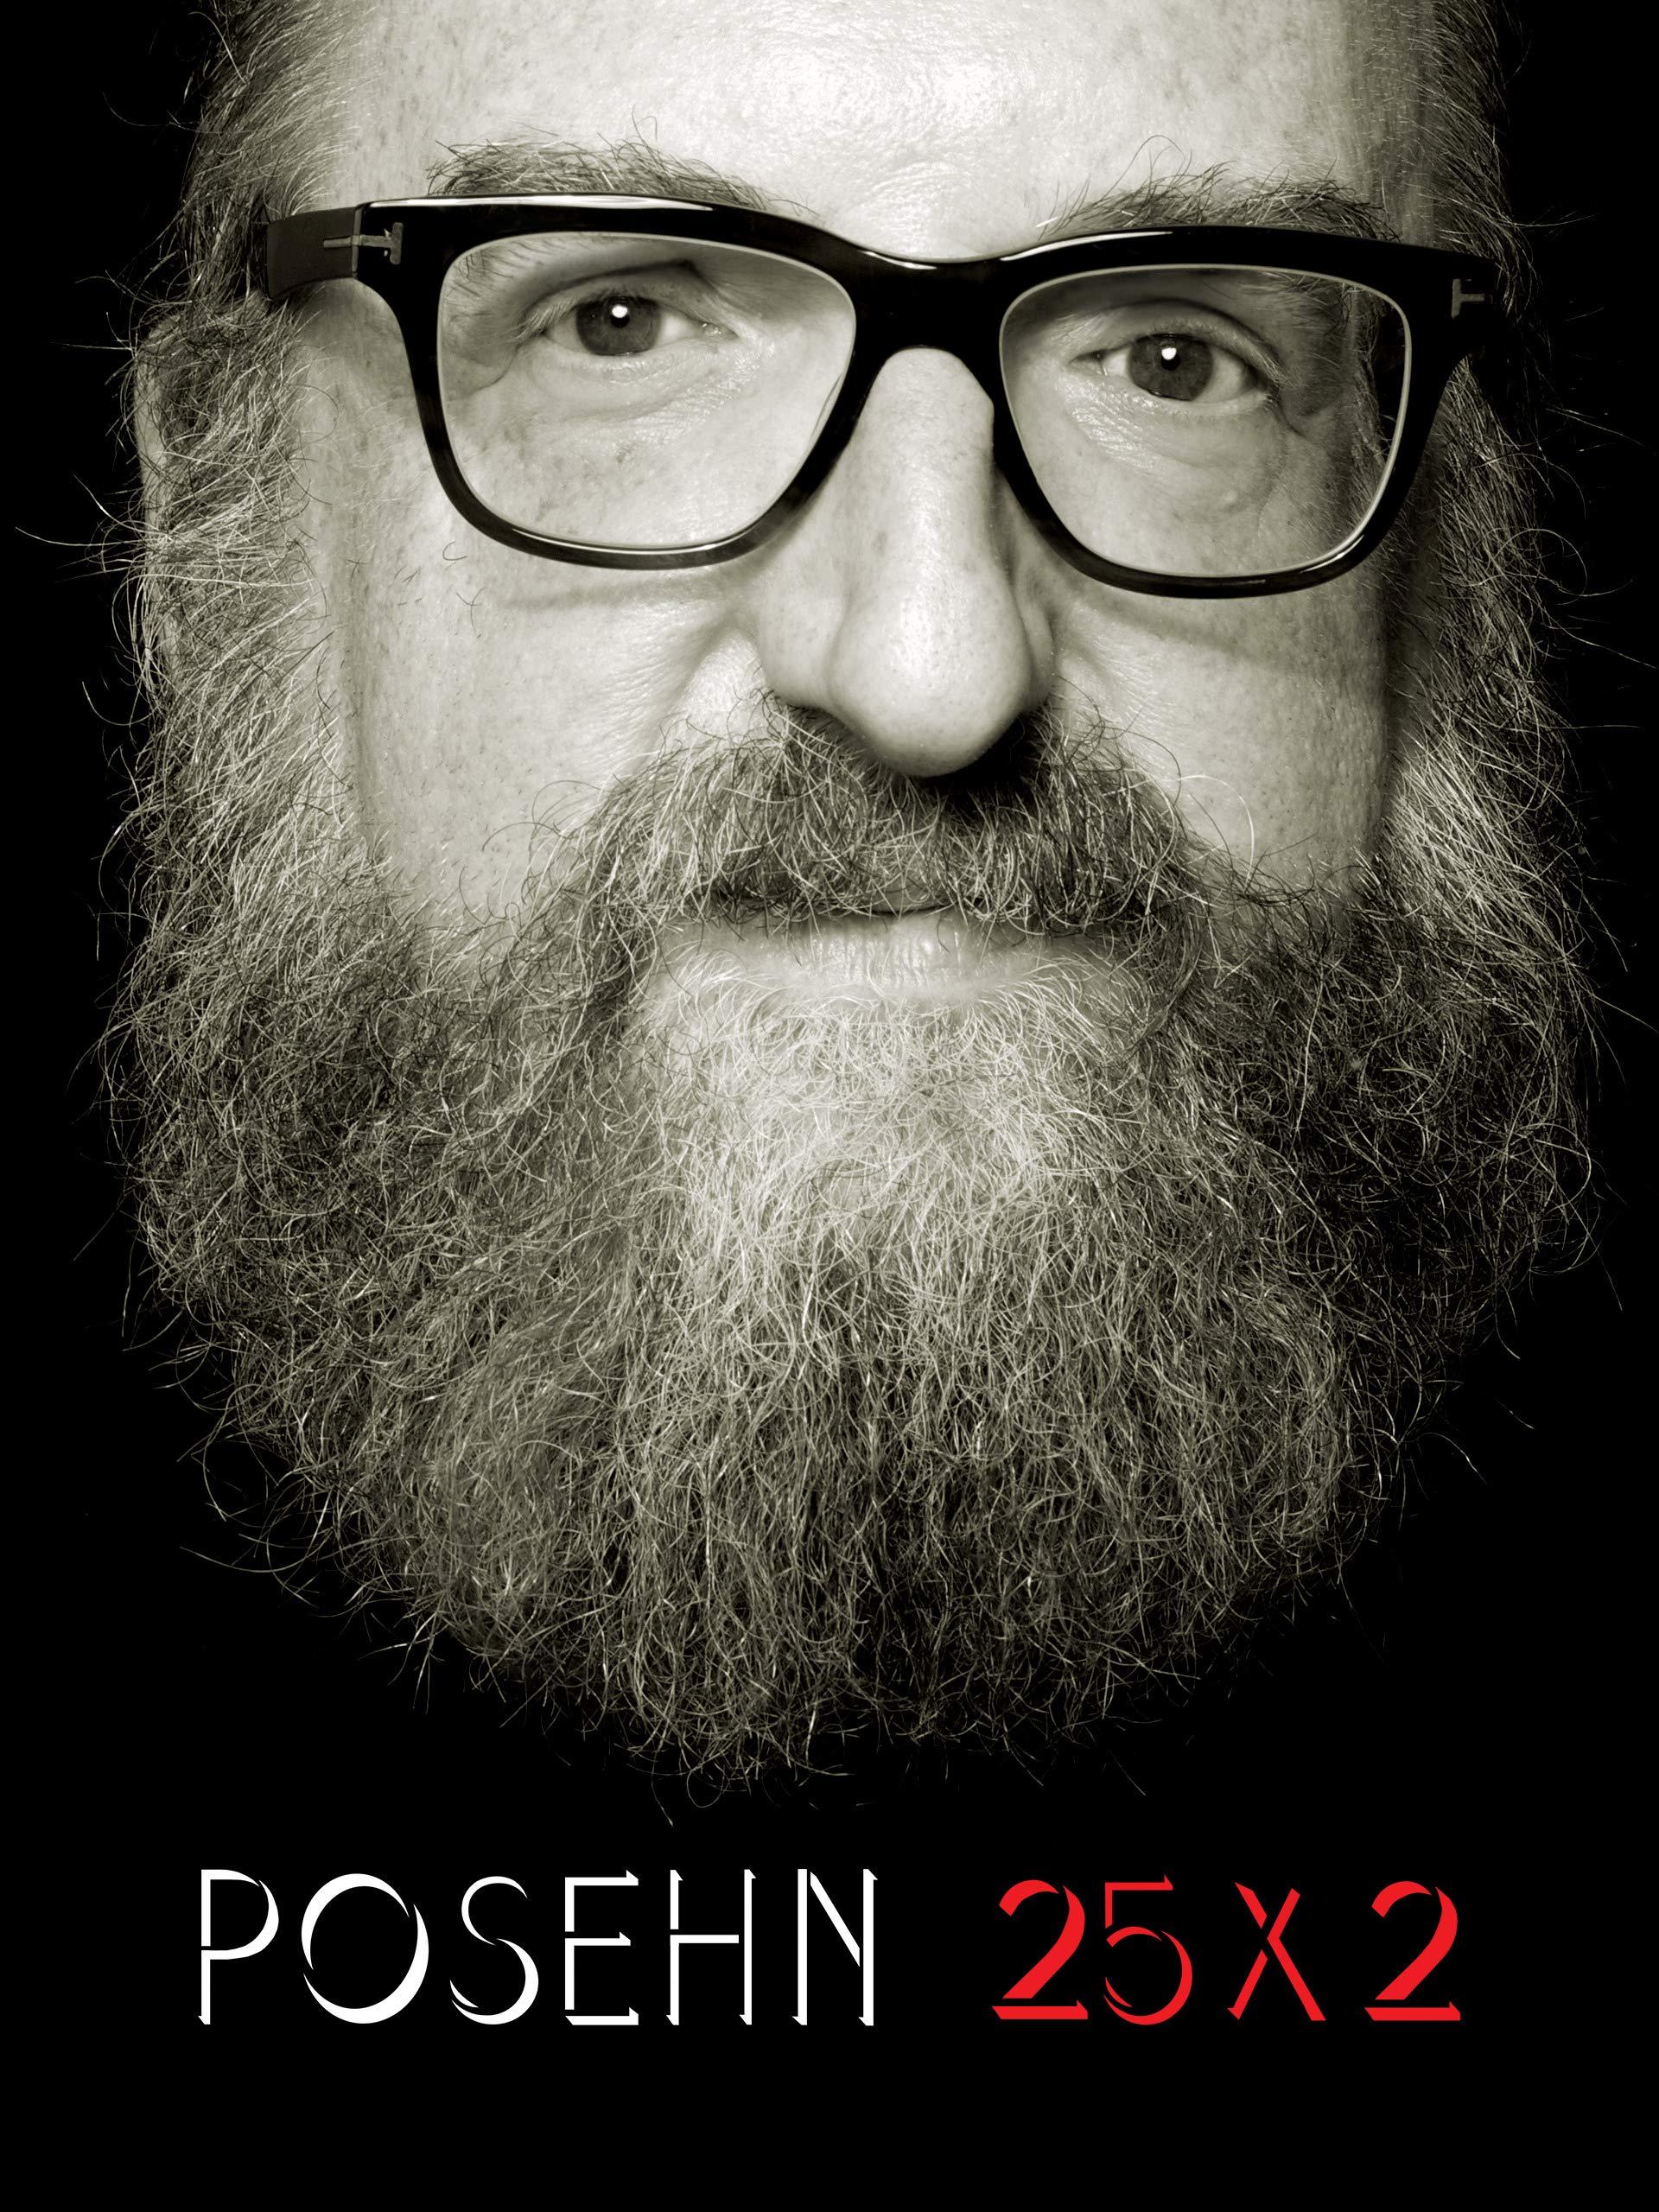 Brian Posehn: 25x2